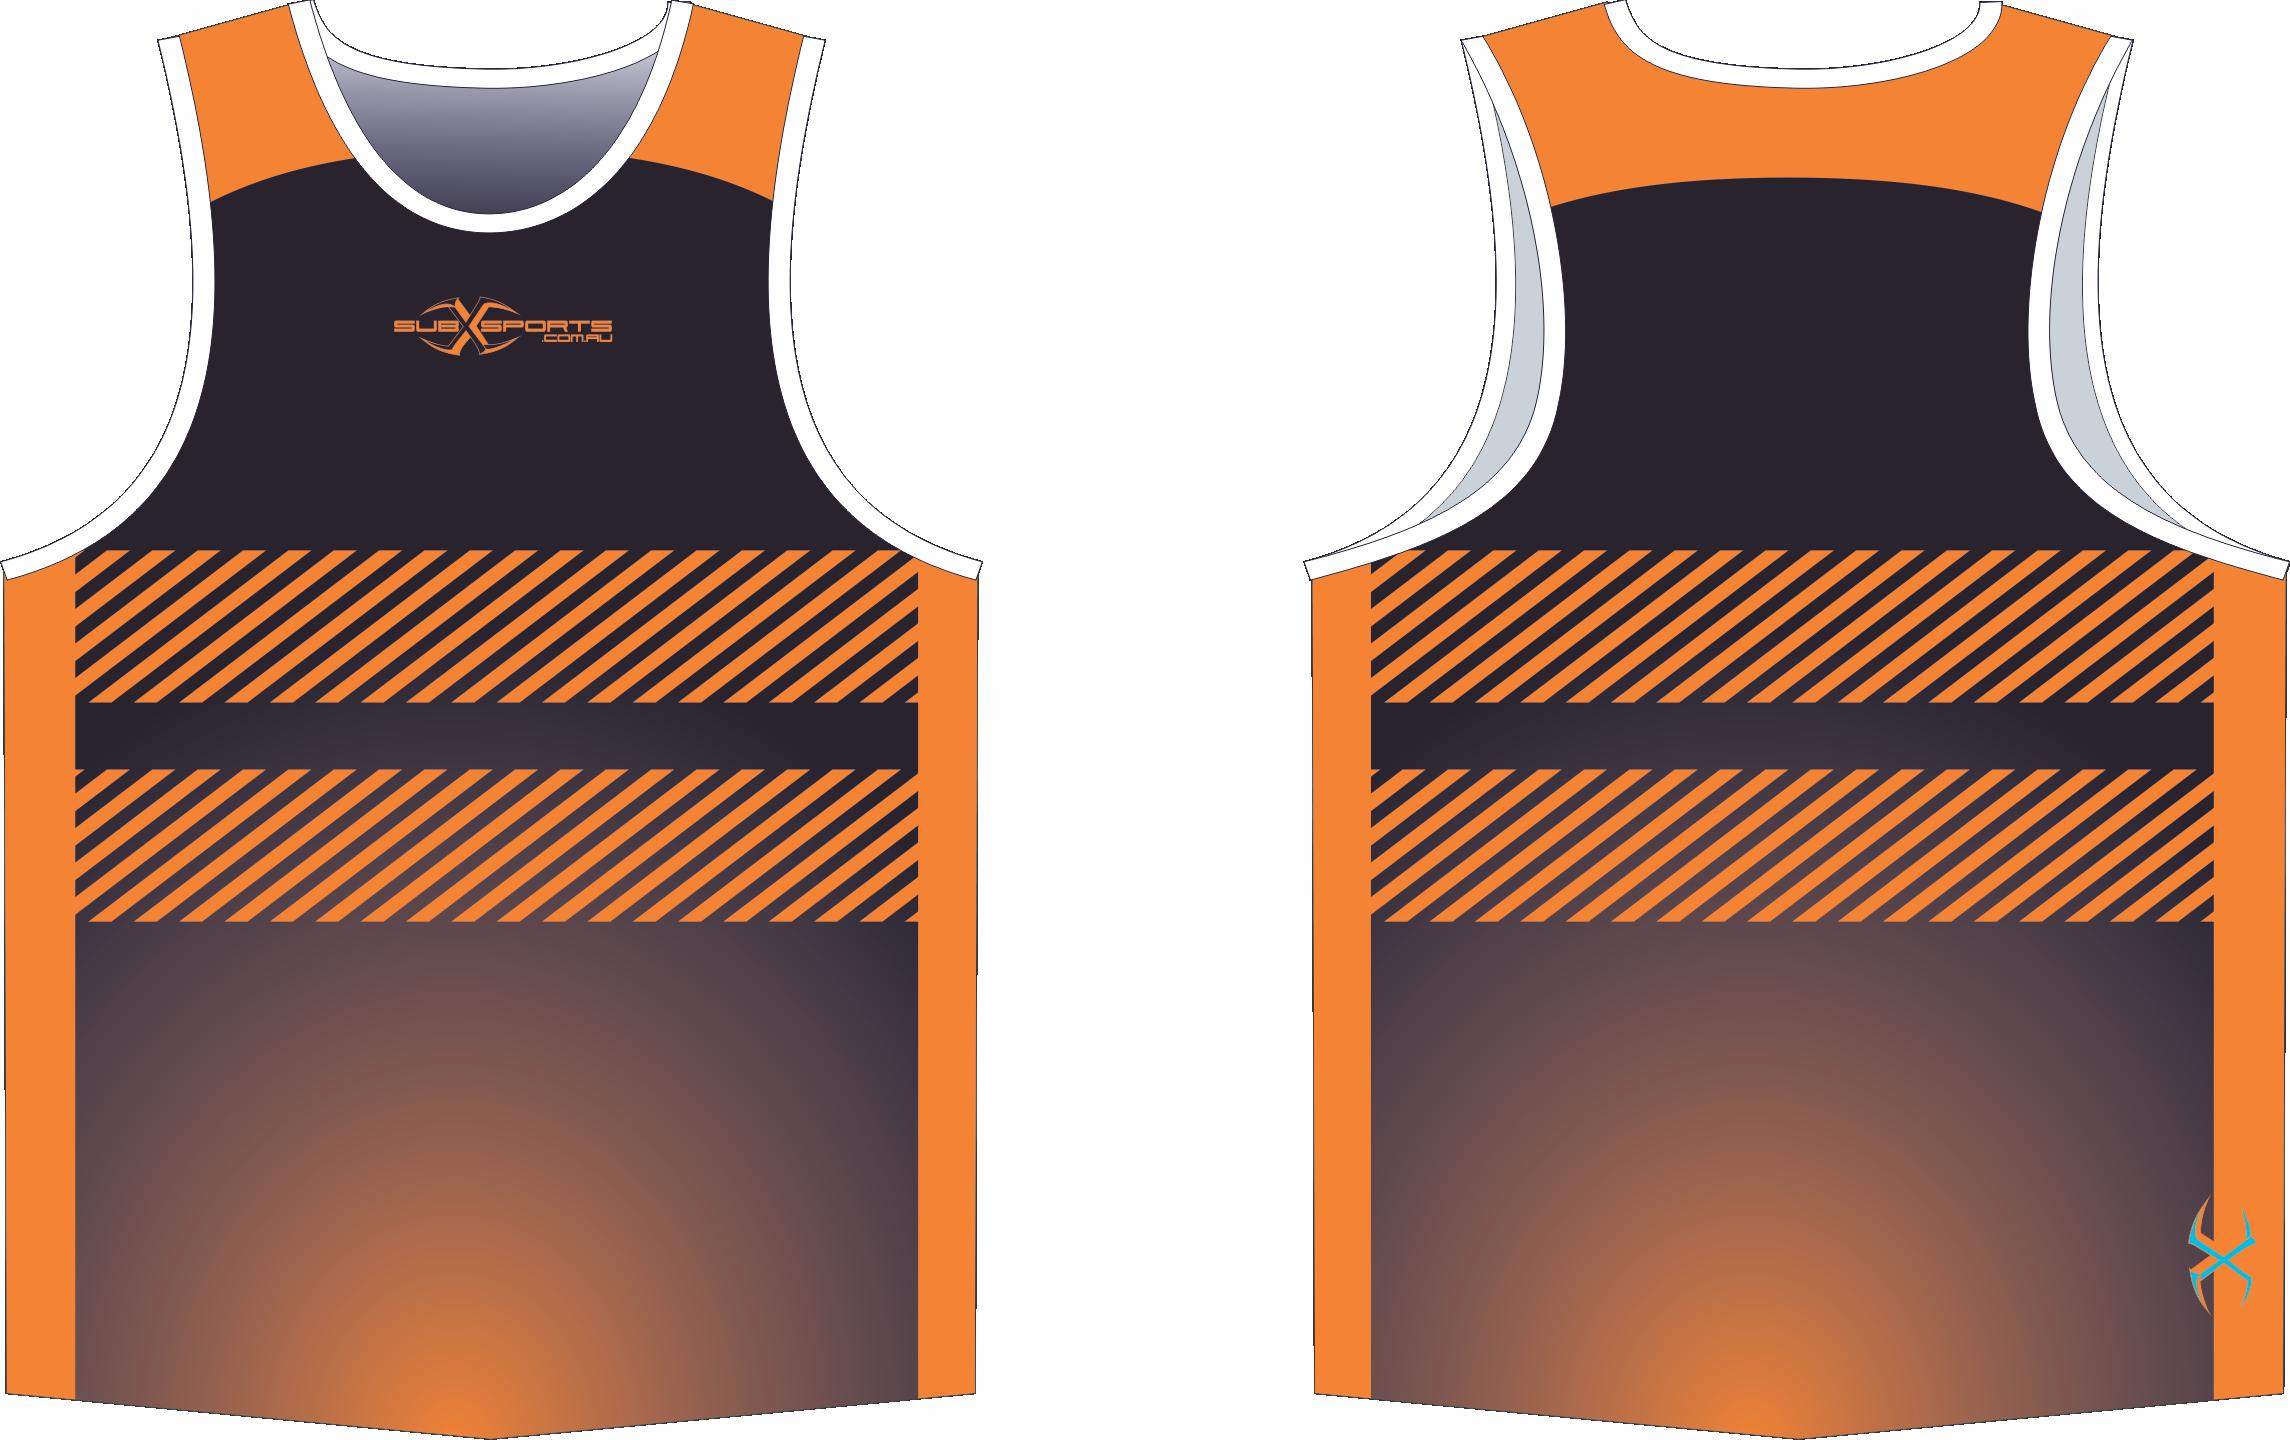 X305XS Singlet Black Orange.png